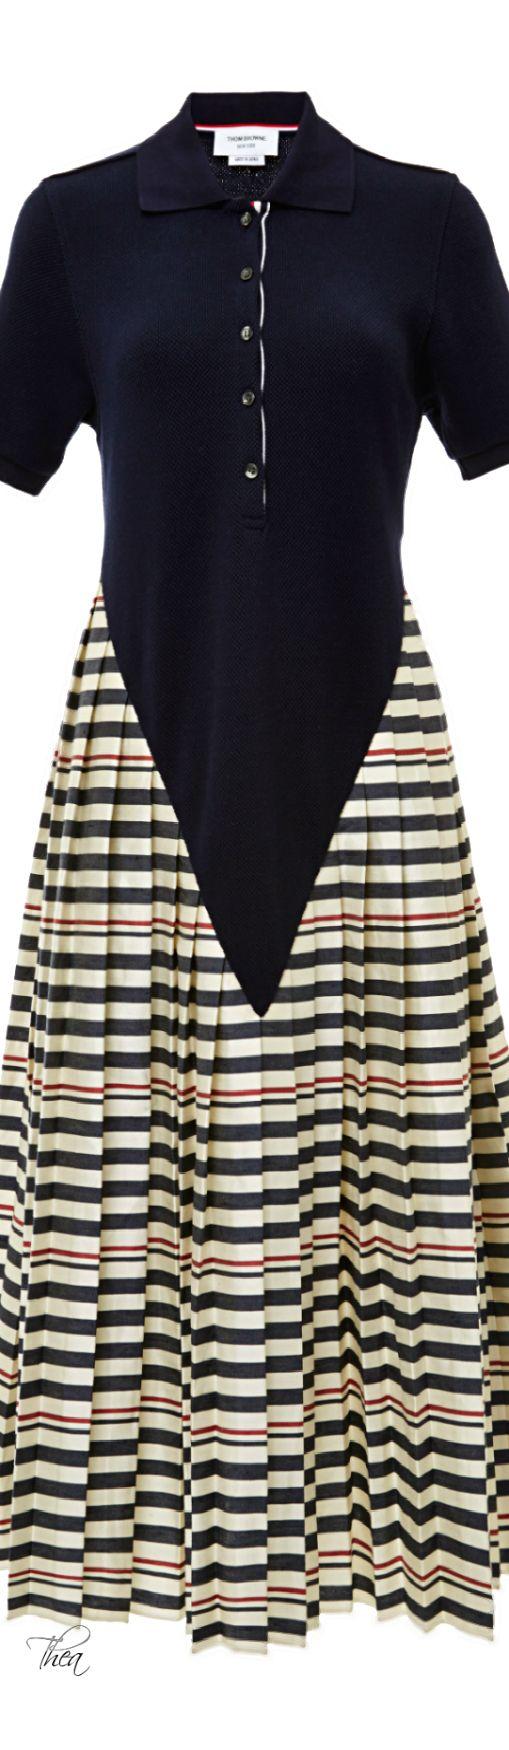 Thom Browne ● Resort 2015 Classic Thigh Length Shirt Dress